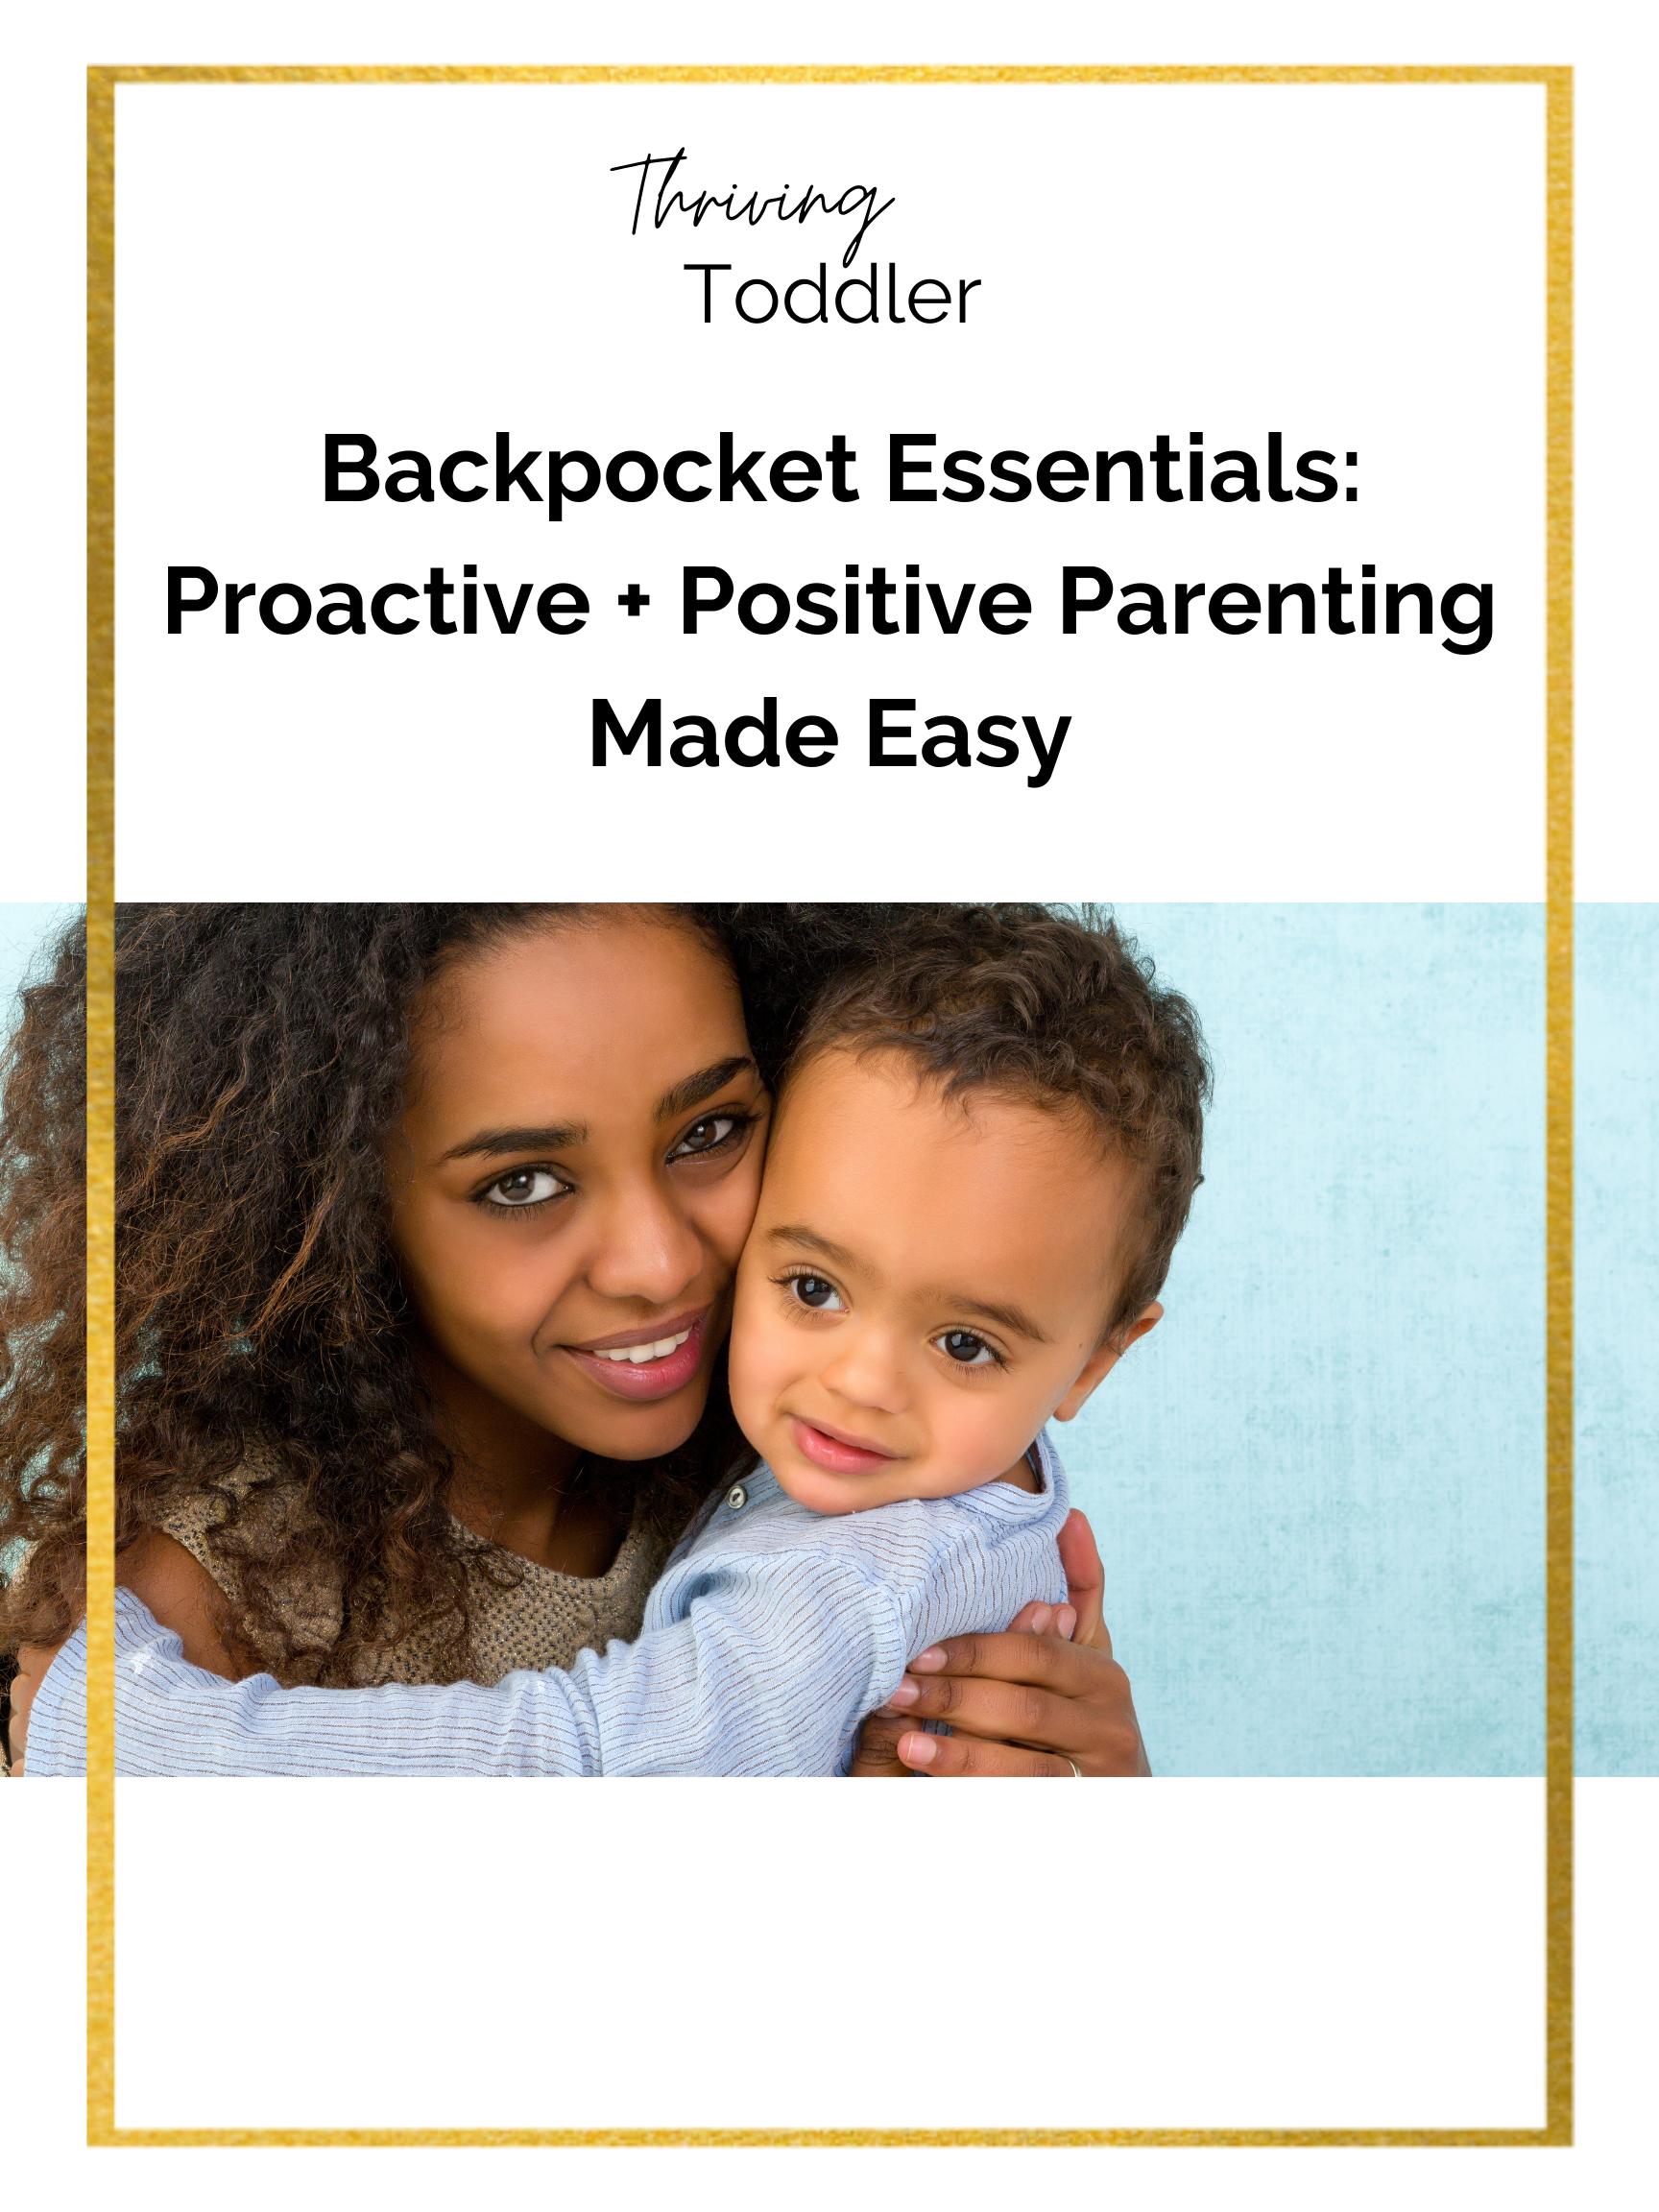 Backpocket Essential's